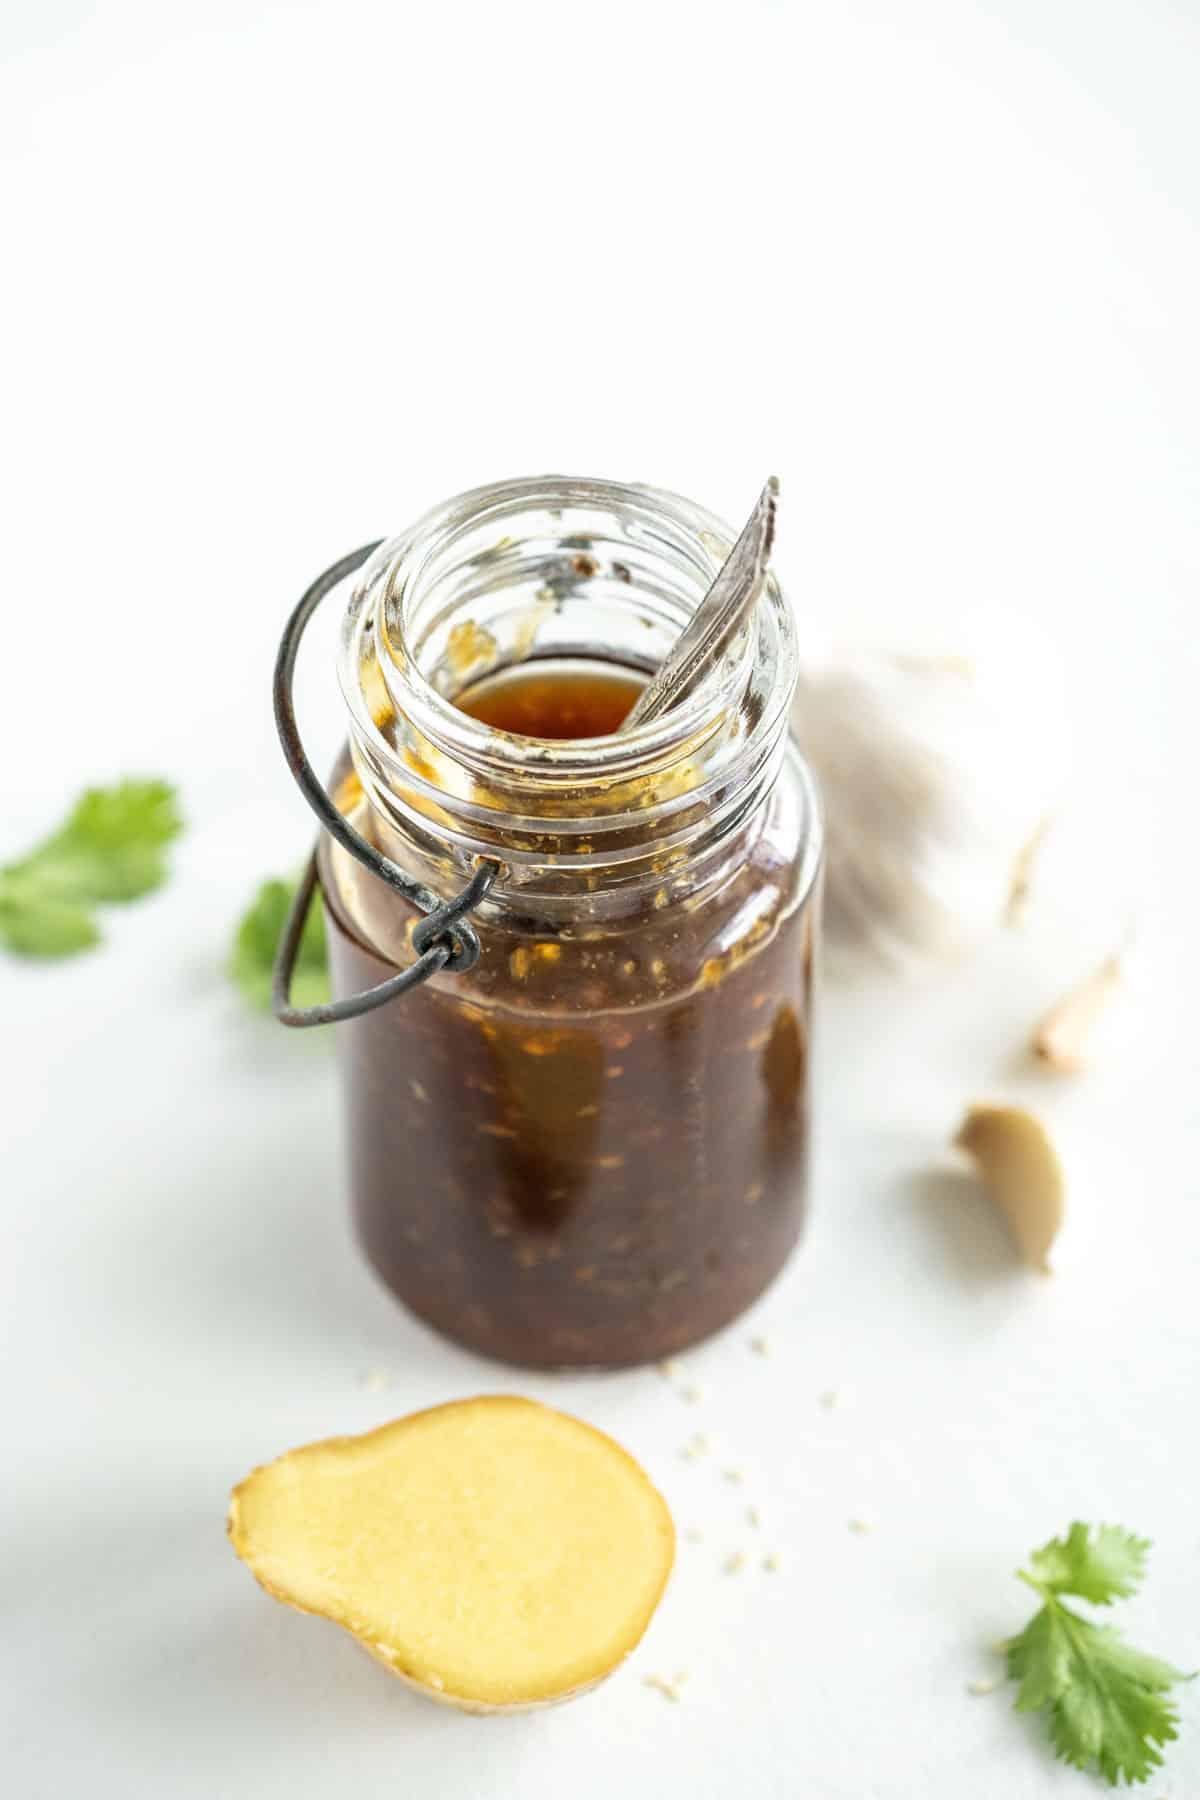 jar of gluten-free teriyaki sauce with fresh ginger, herbs and garlic